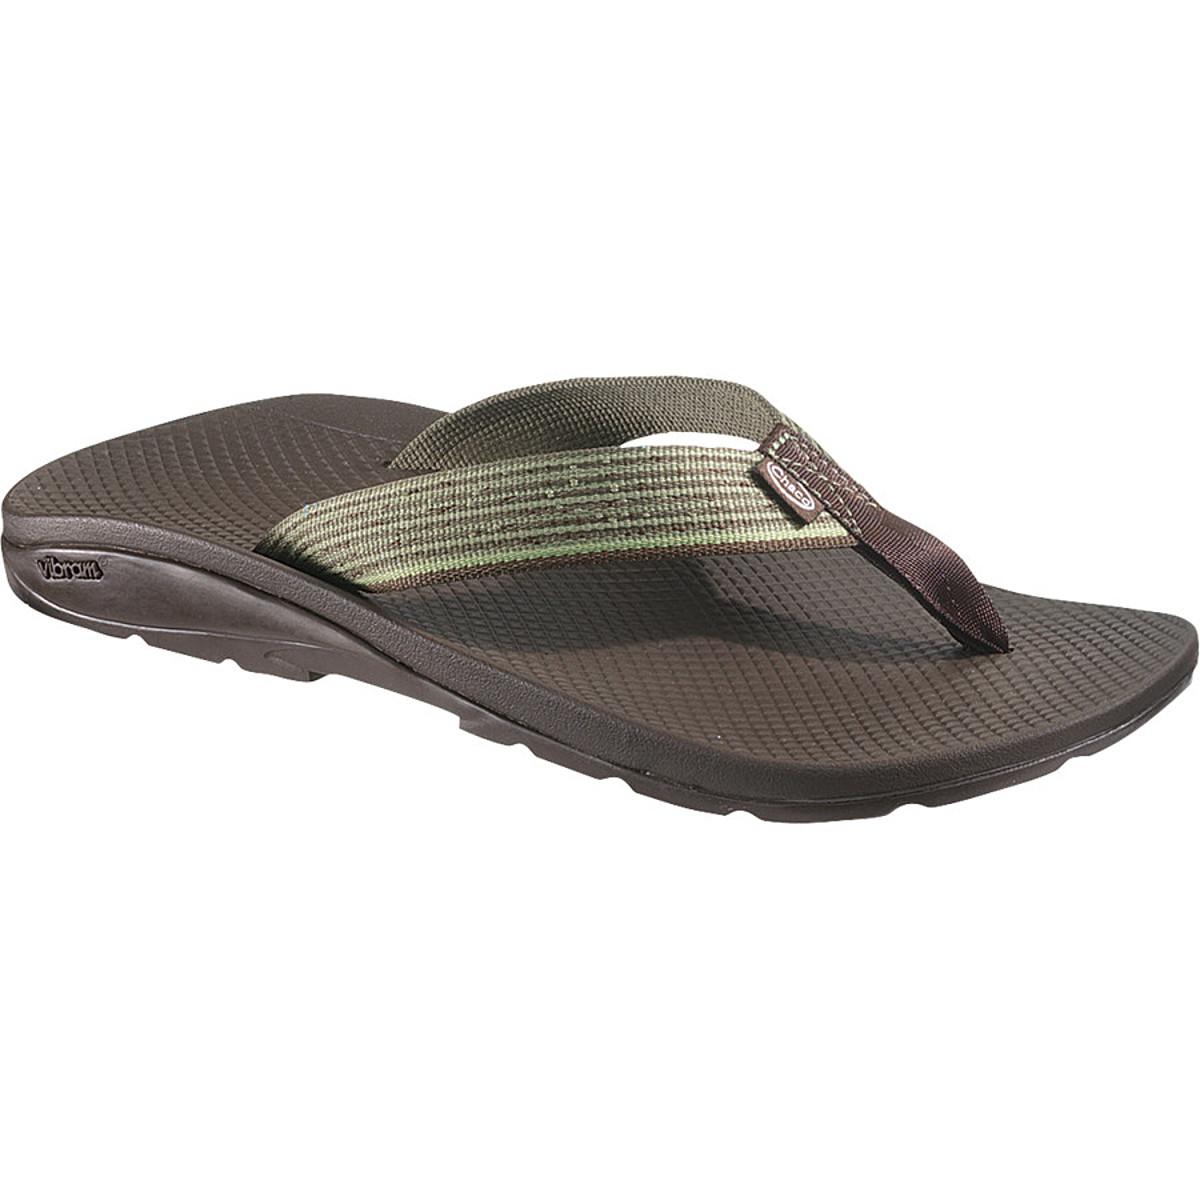 photo: Chaco Flip flip-flop